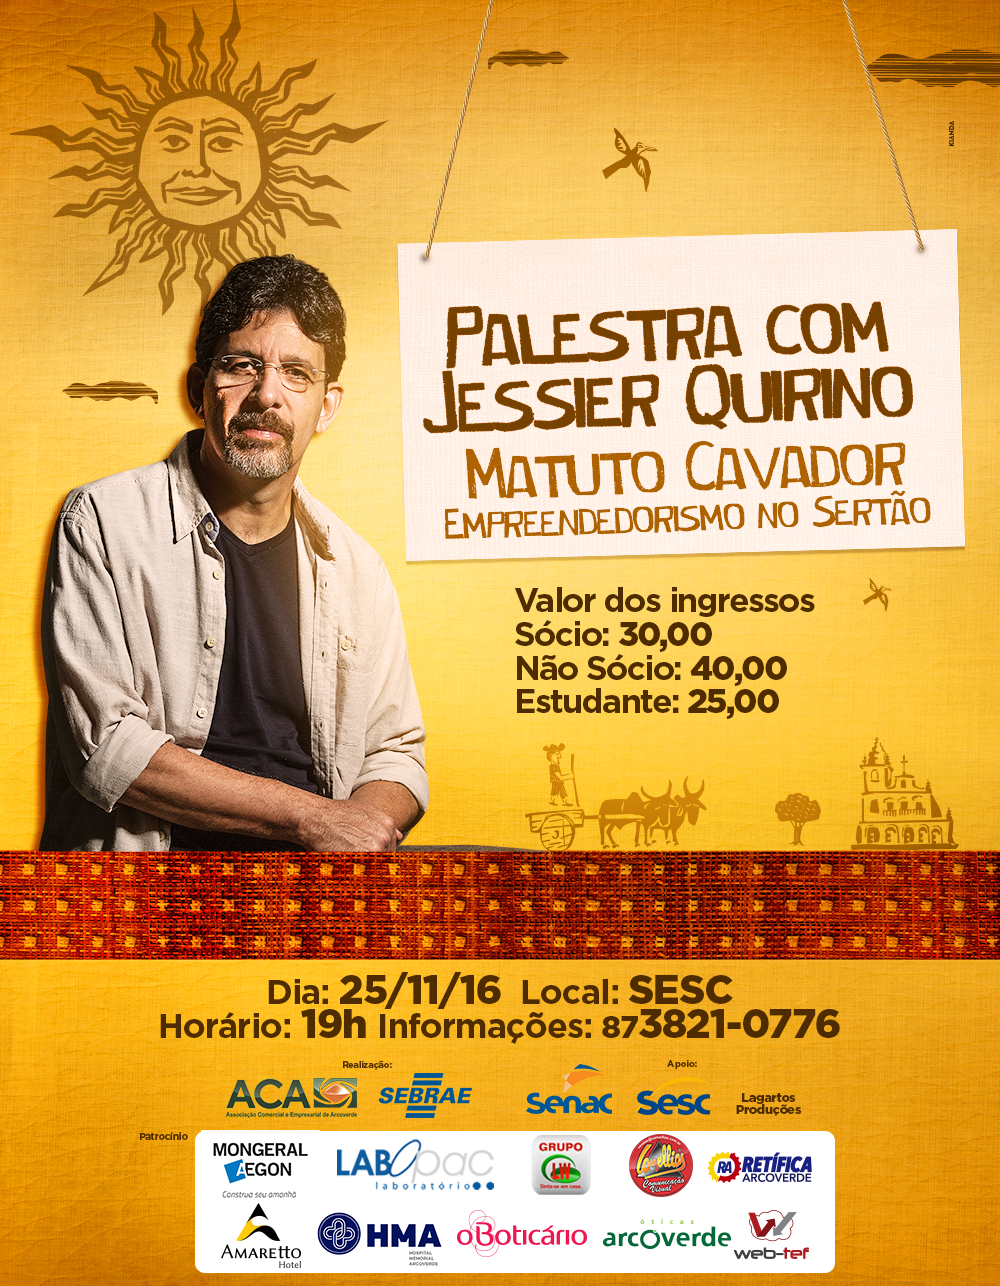 jessier_querino_palestra